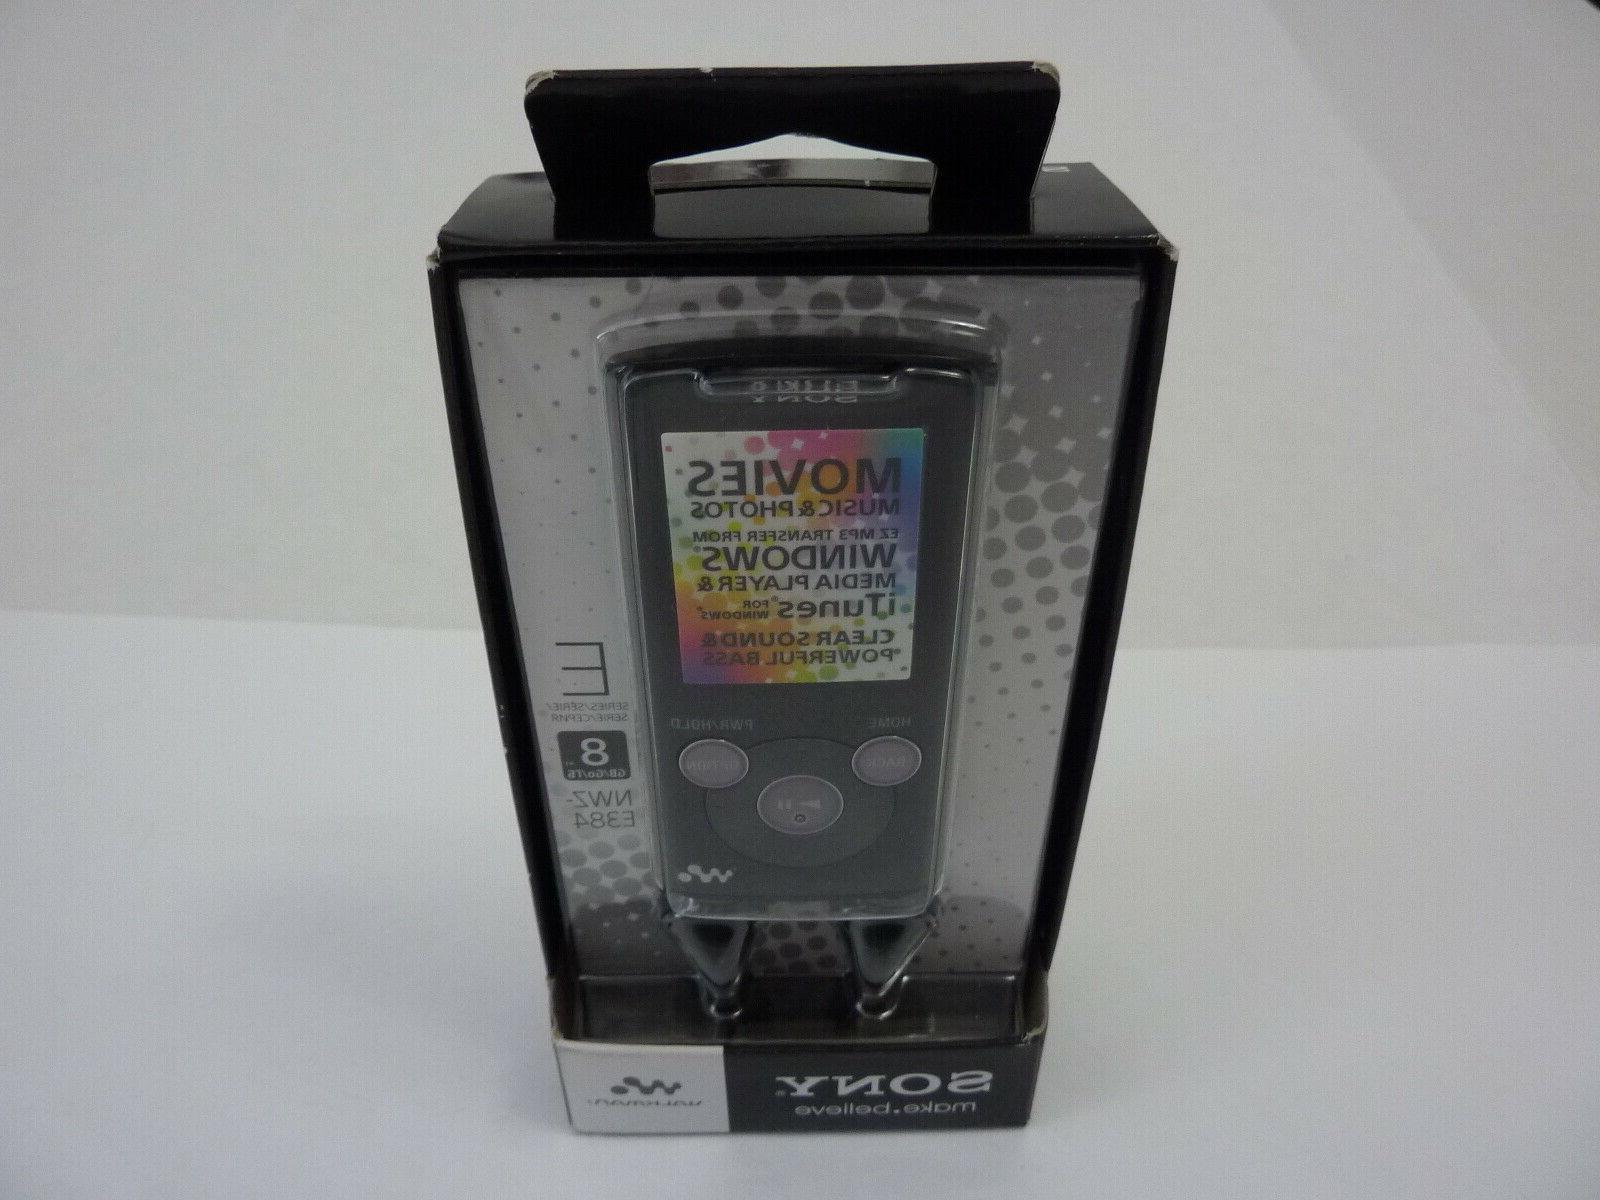 new walkman nwz e384 portable mp3 music